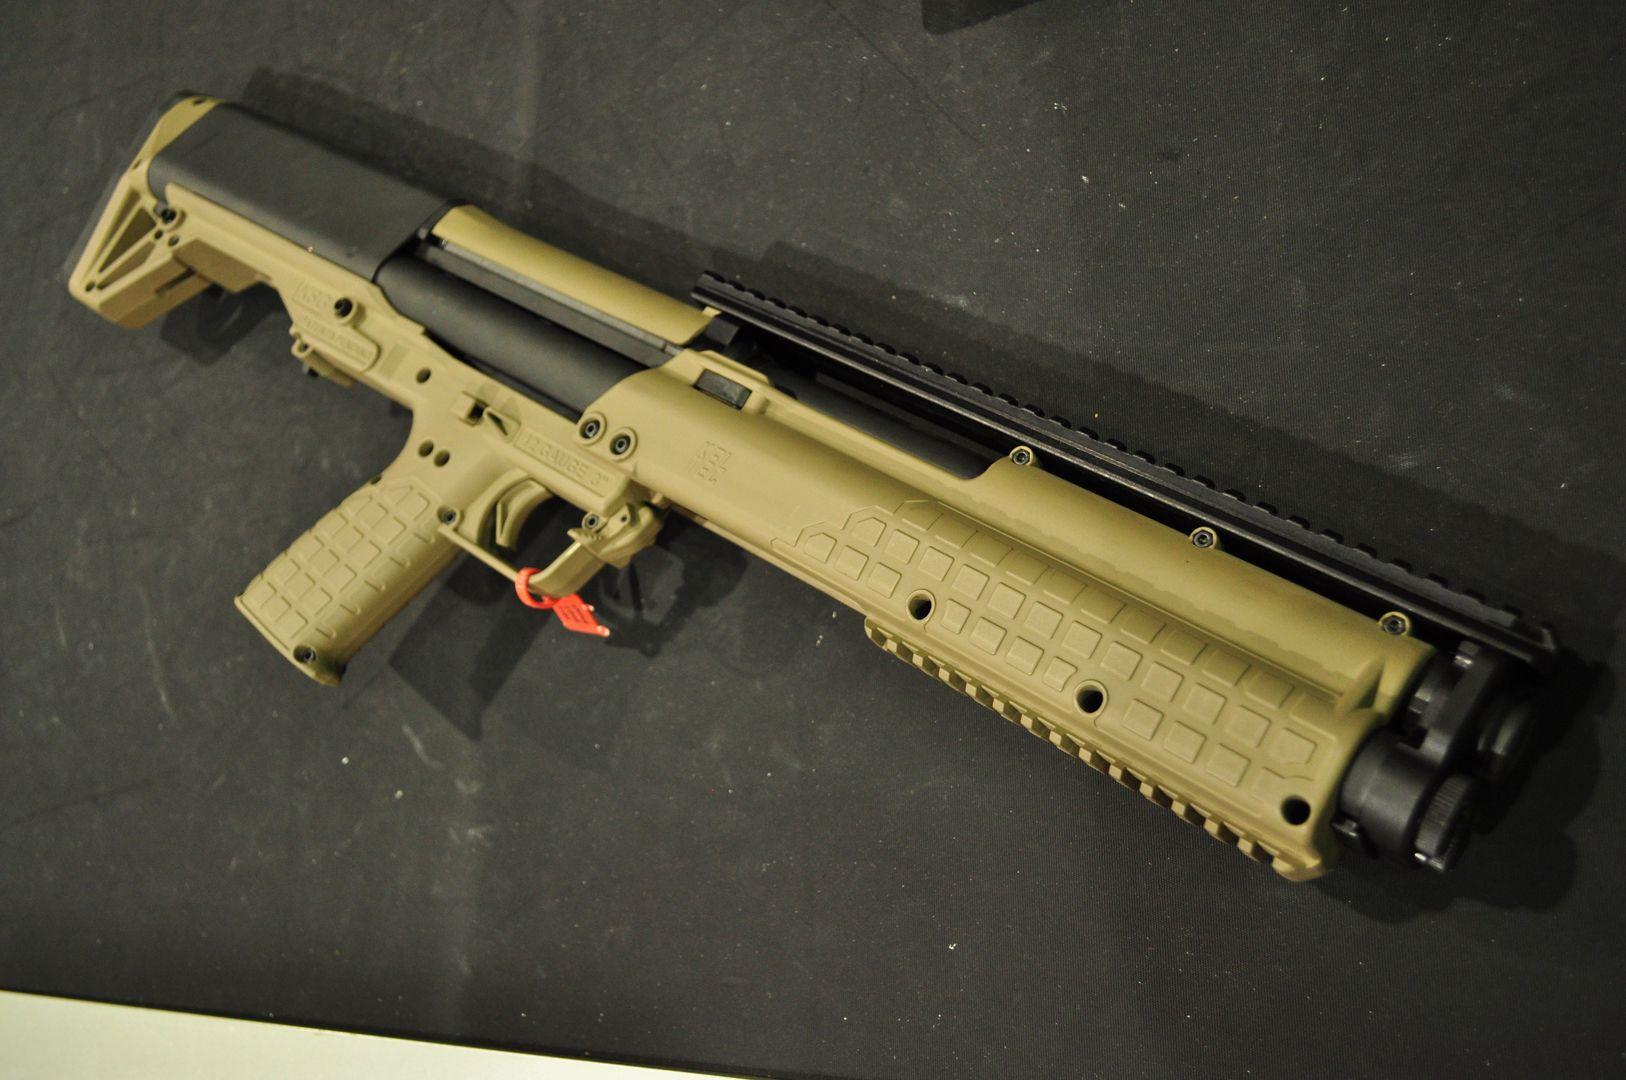 Kel_Tec_KSG_Dark_Earth_Bullpup_Shotgun Guns & Gear